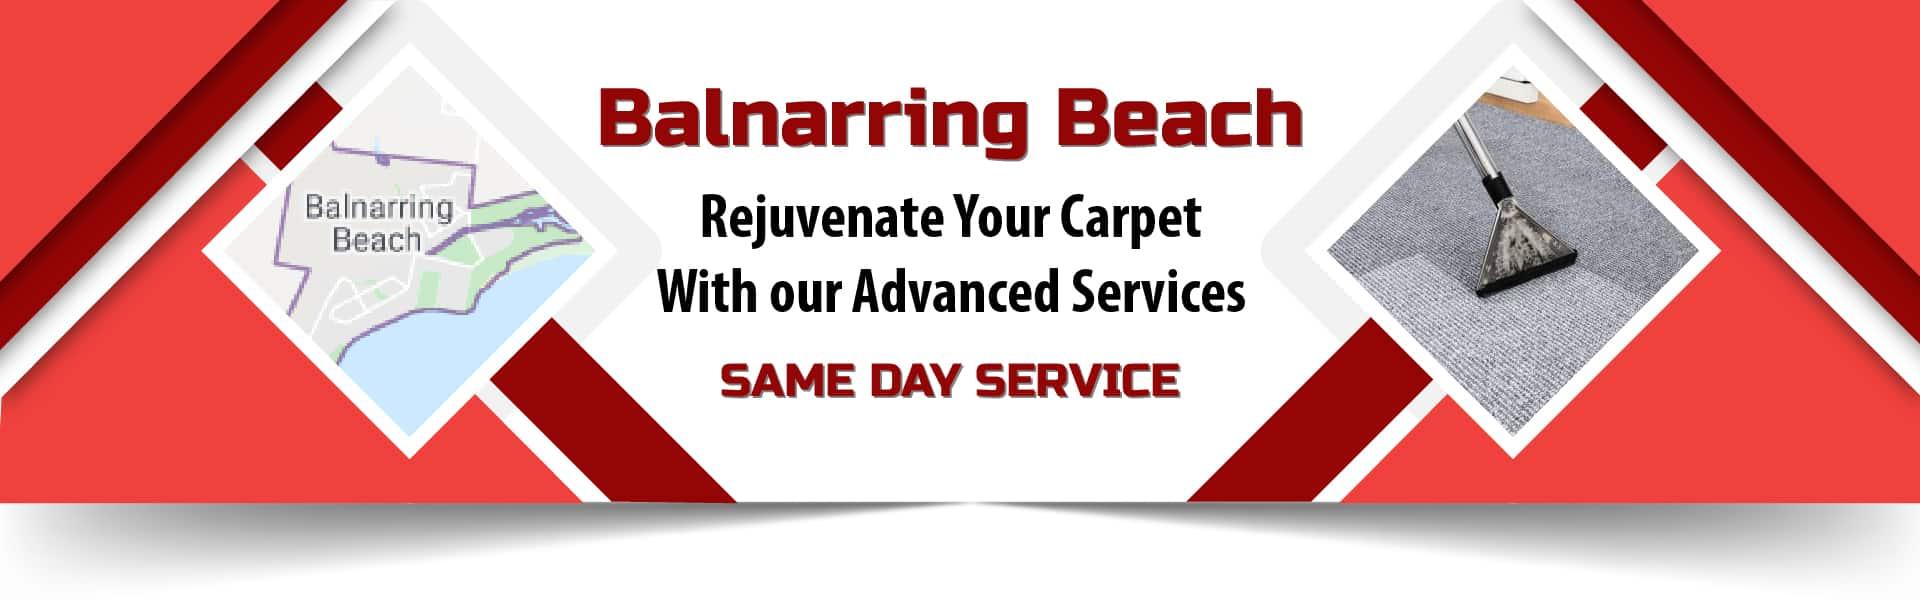 Carpet Cleaning Balnarring Beach